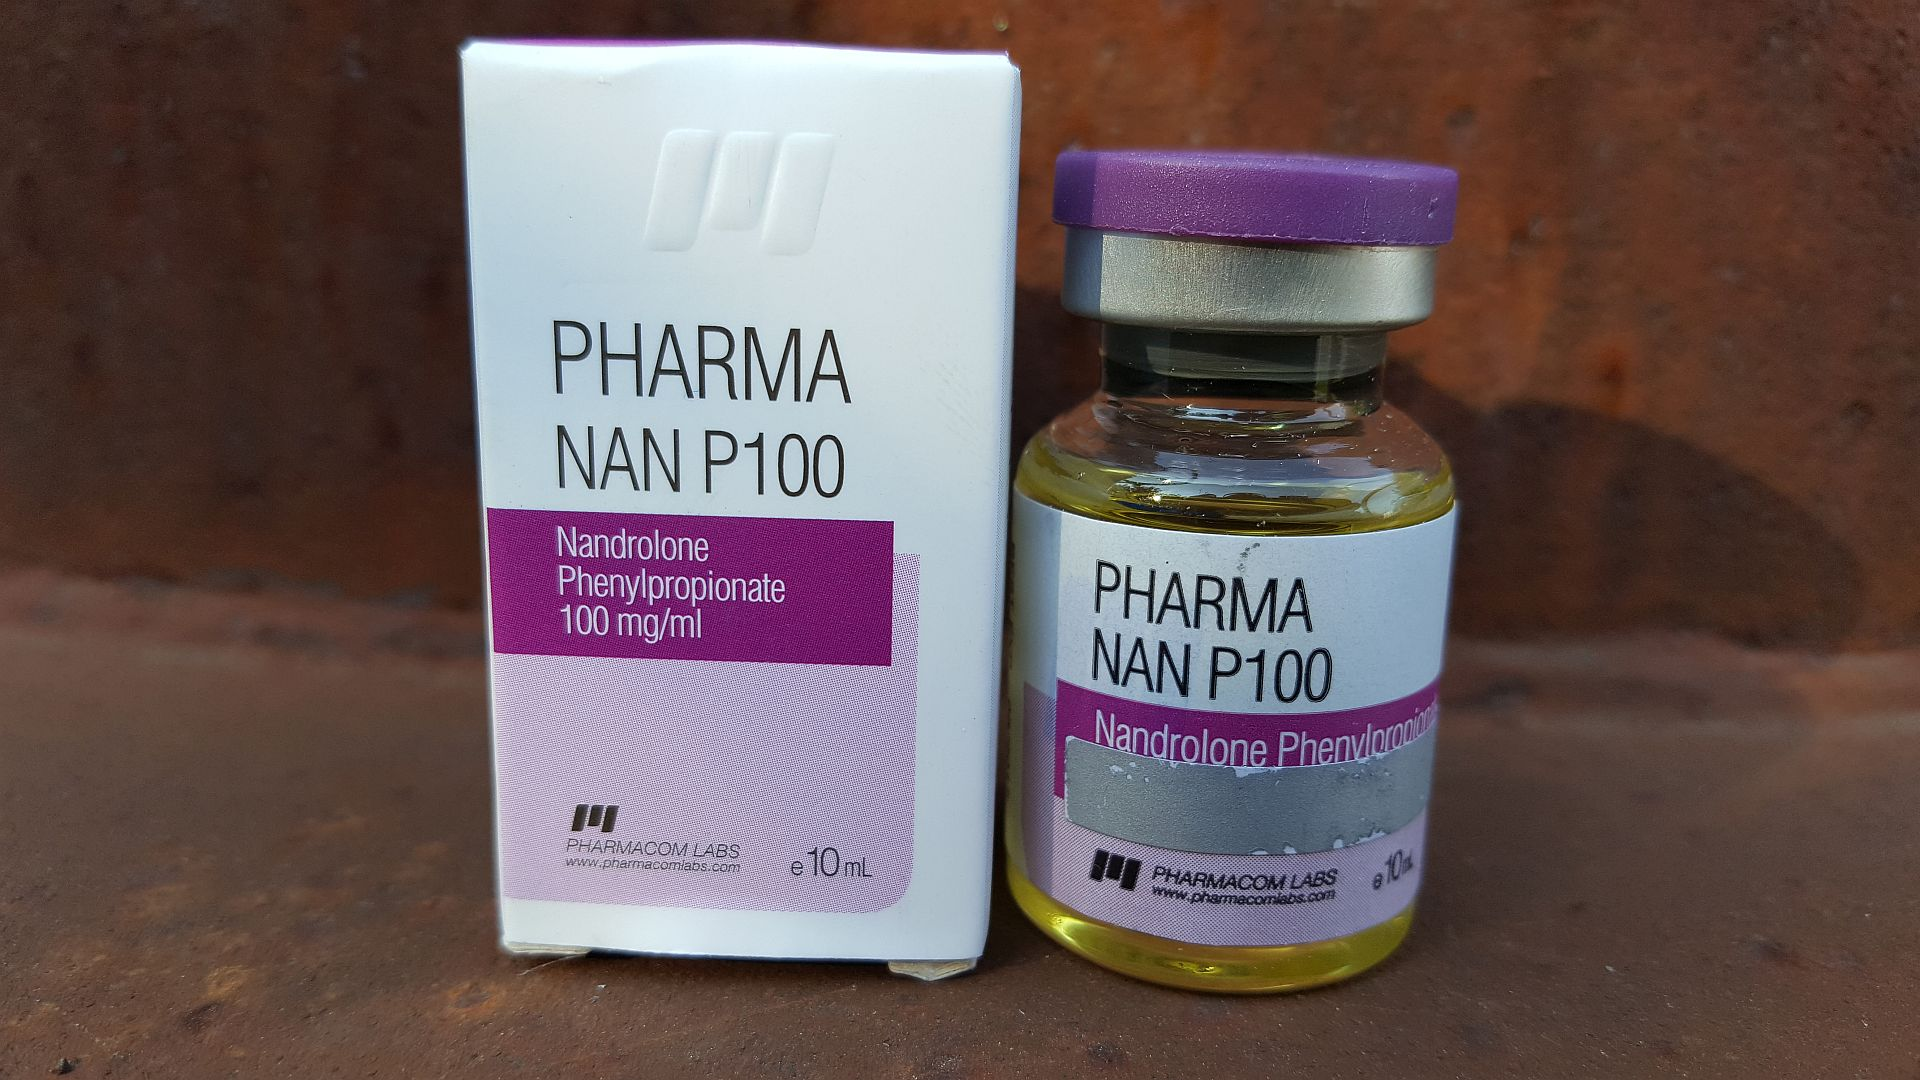 Pharmacom Labs Nandrolone Phenylpropionate Scrutinized by